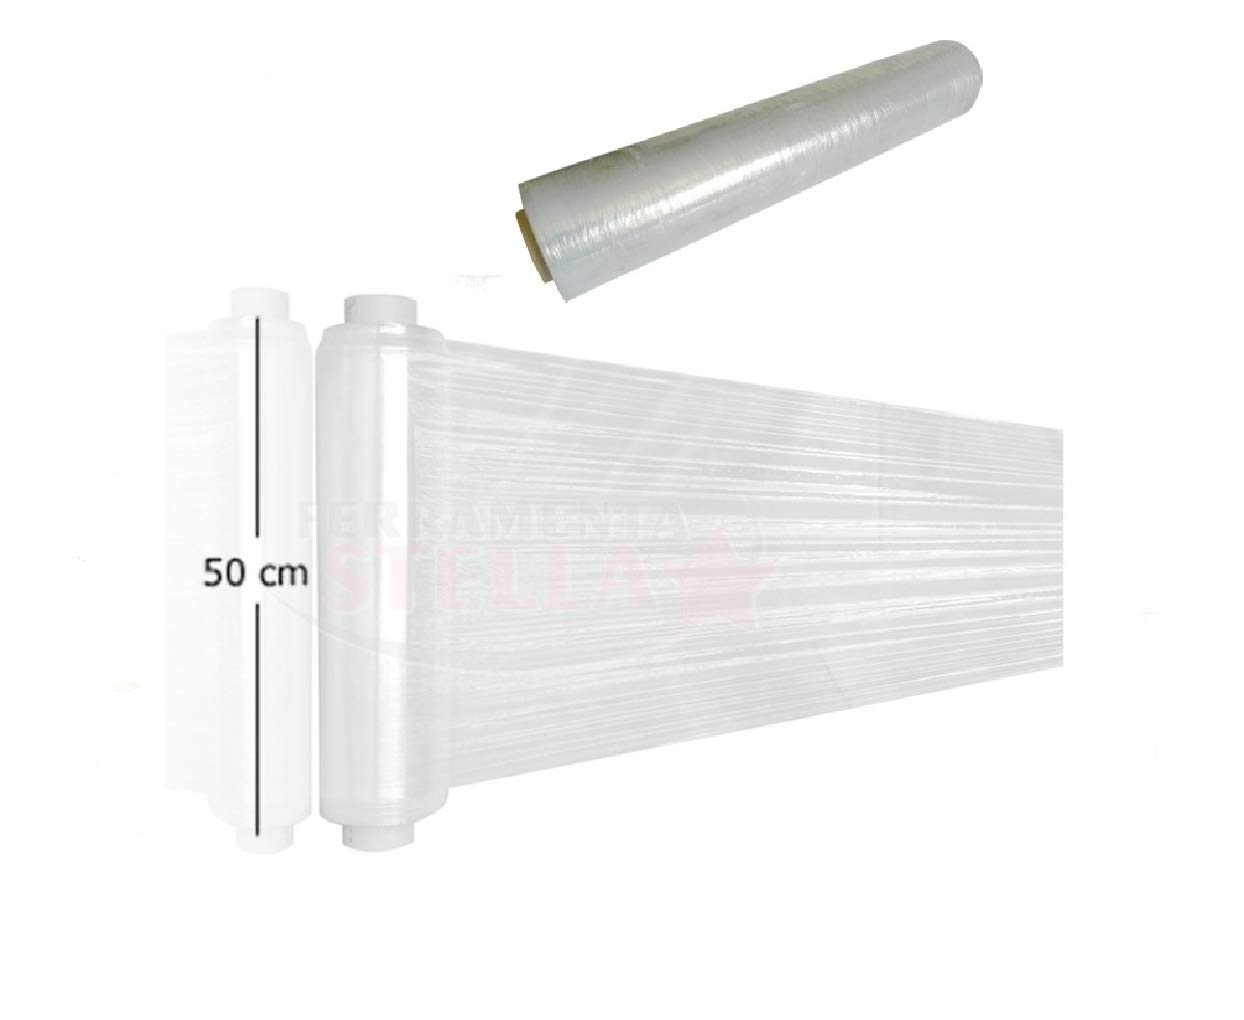 Palucart pellicola film estensibile bianco 6 rotoli da 2,2kg h50cm 23mycron